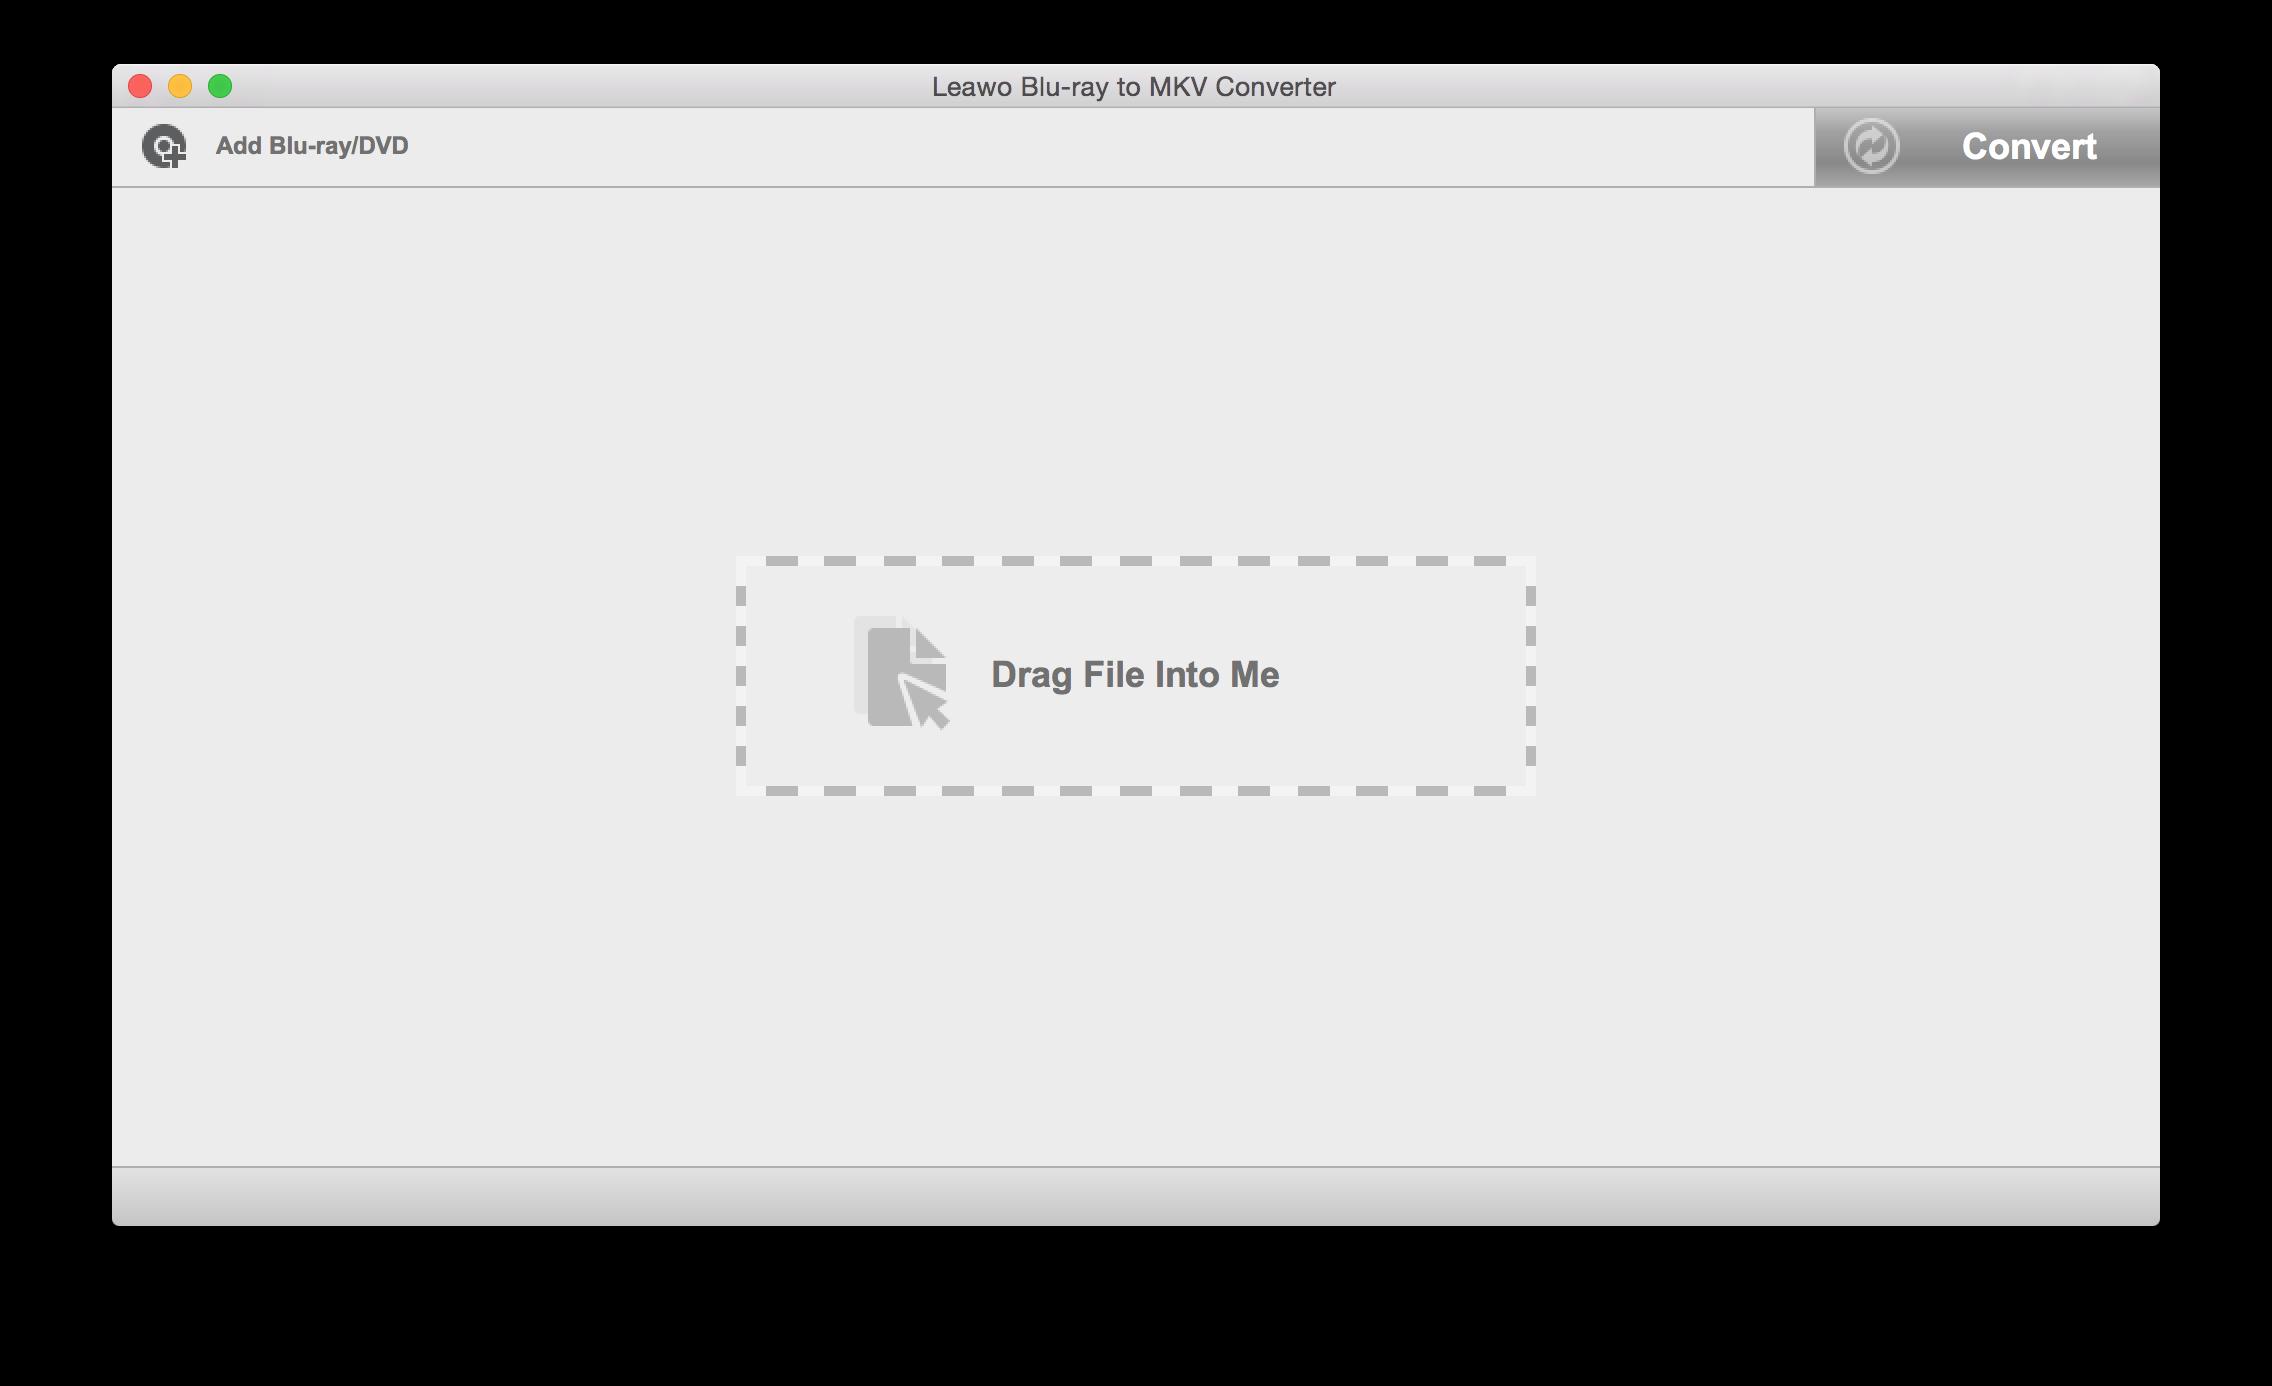 Launch Leawo Blu-ray to MKV Converter for Mac